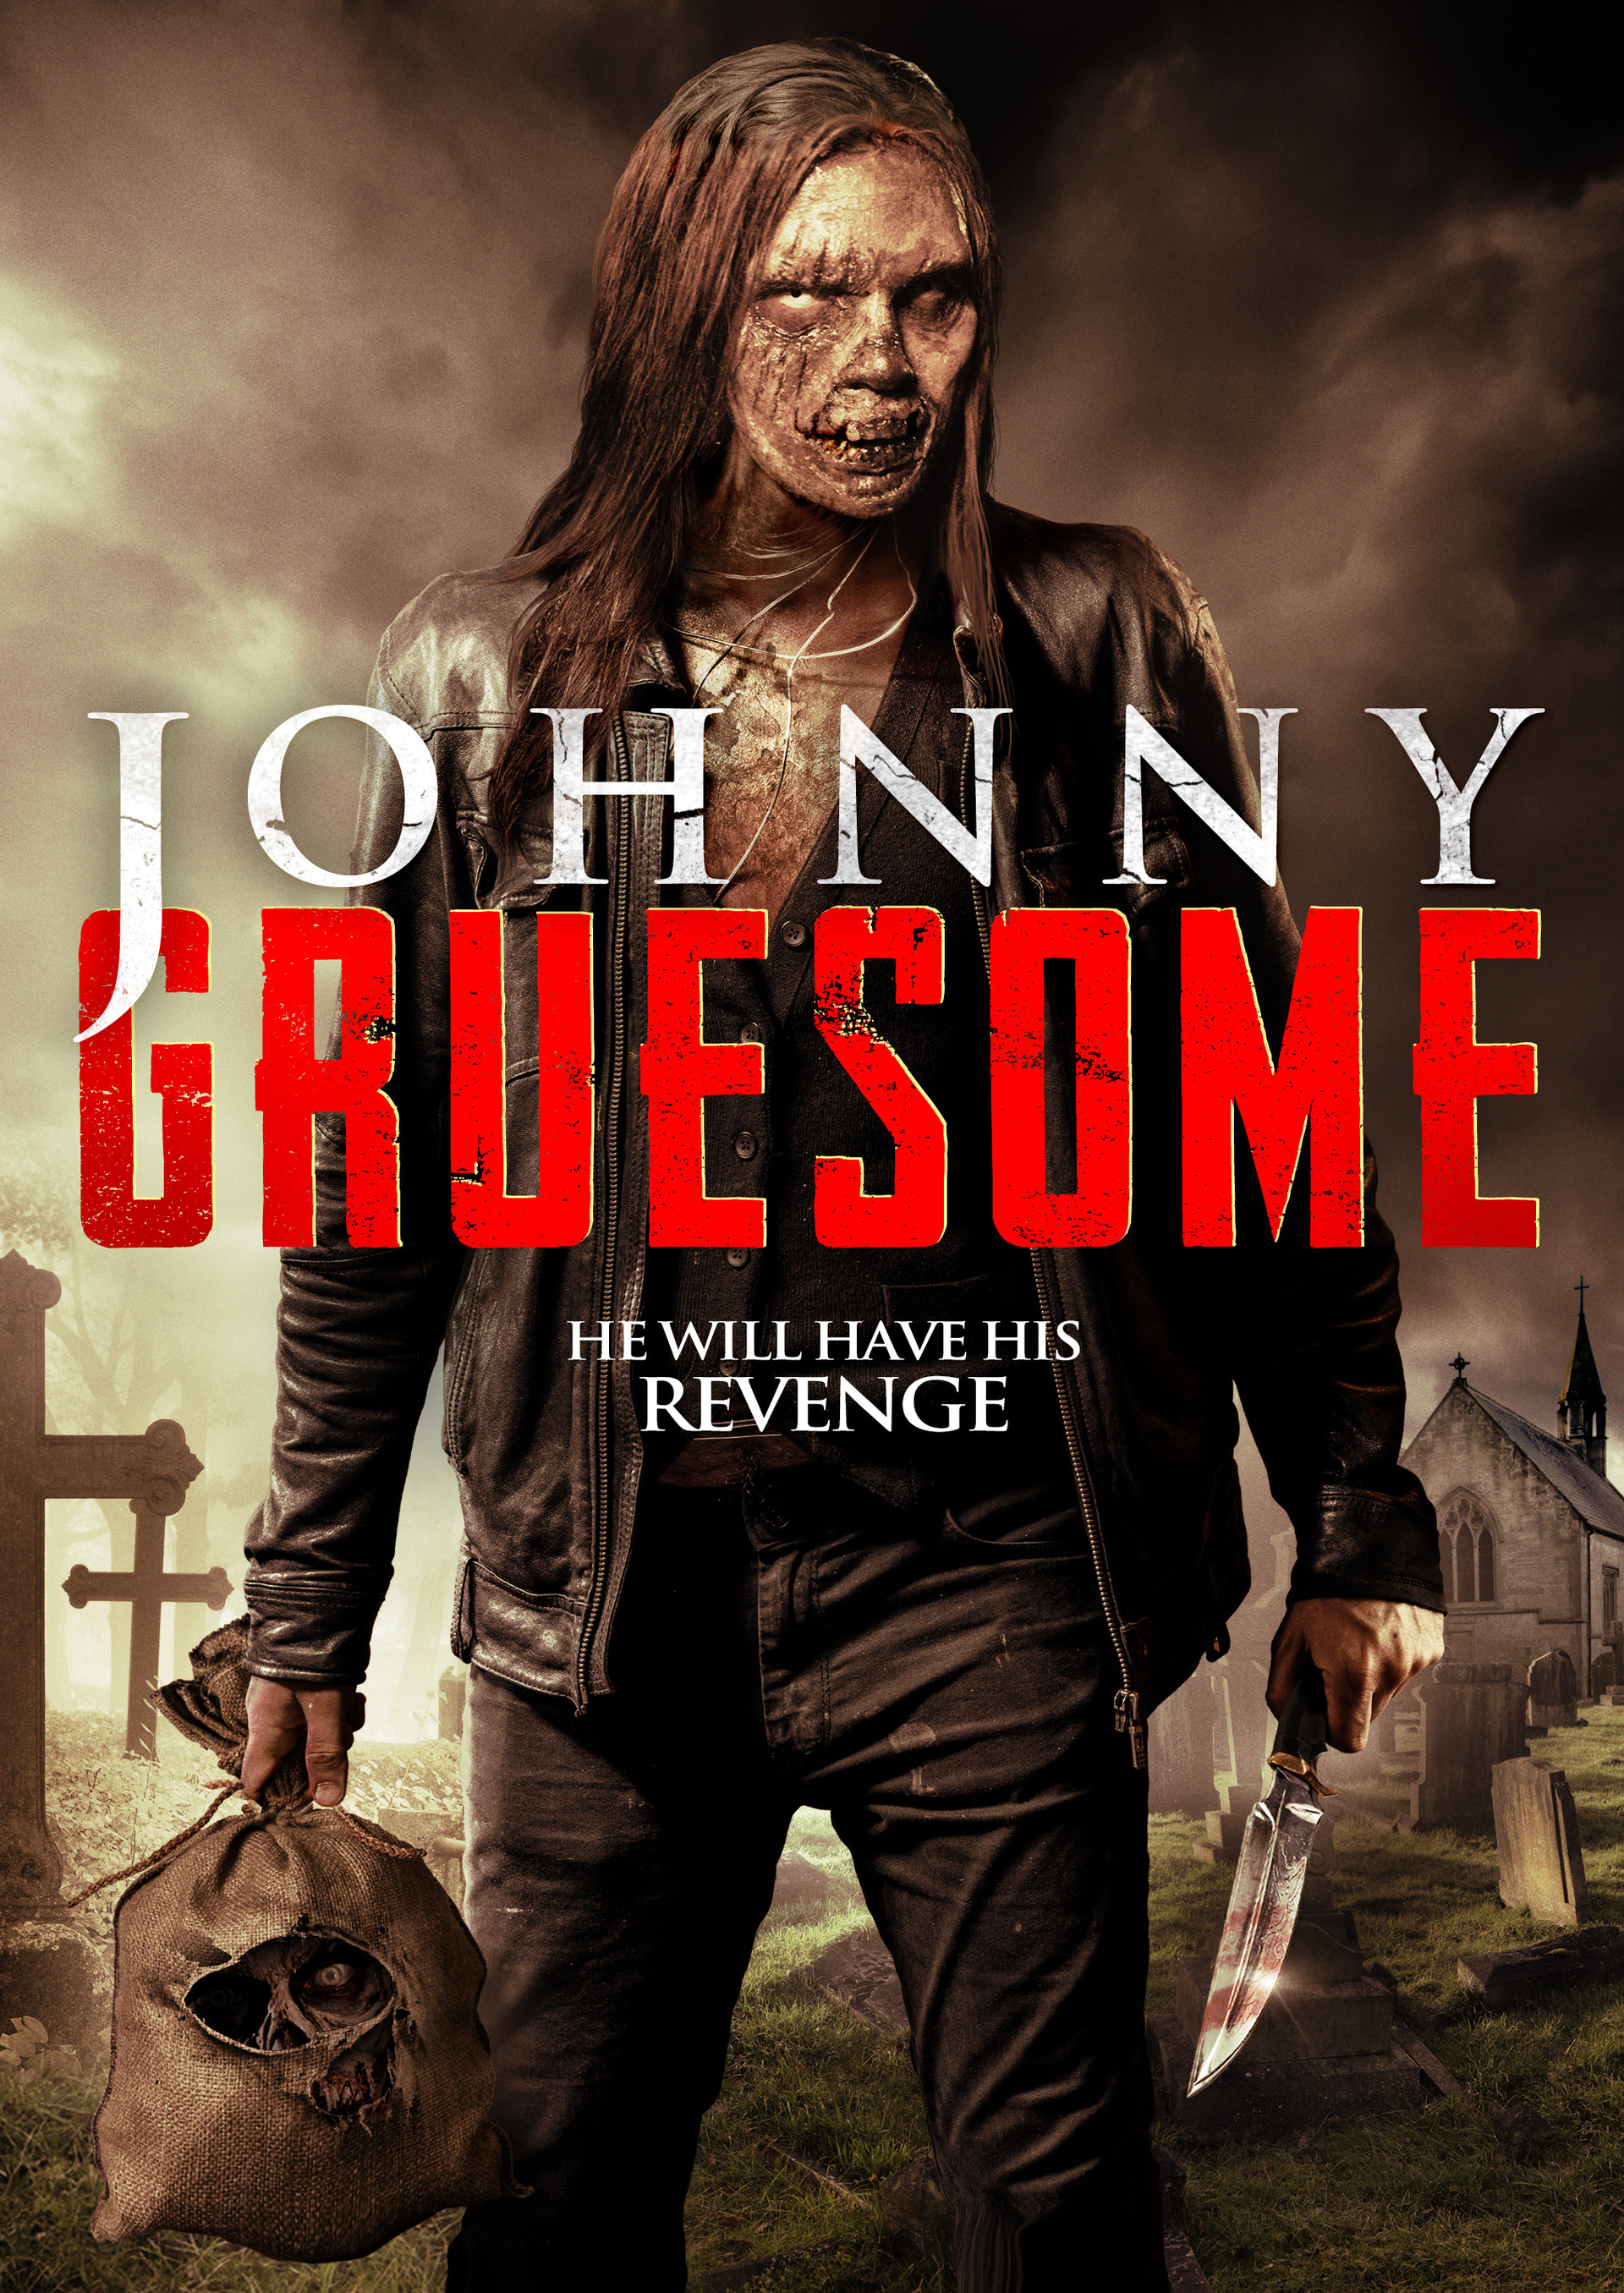 JOHNNY_GRUESOME-KEY_ART-FLAT.jpg